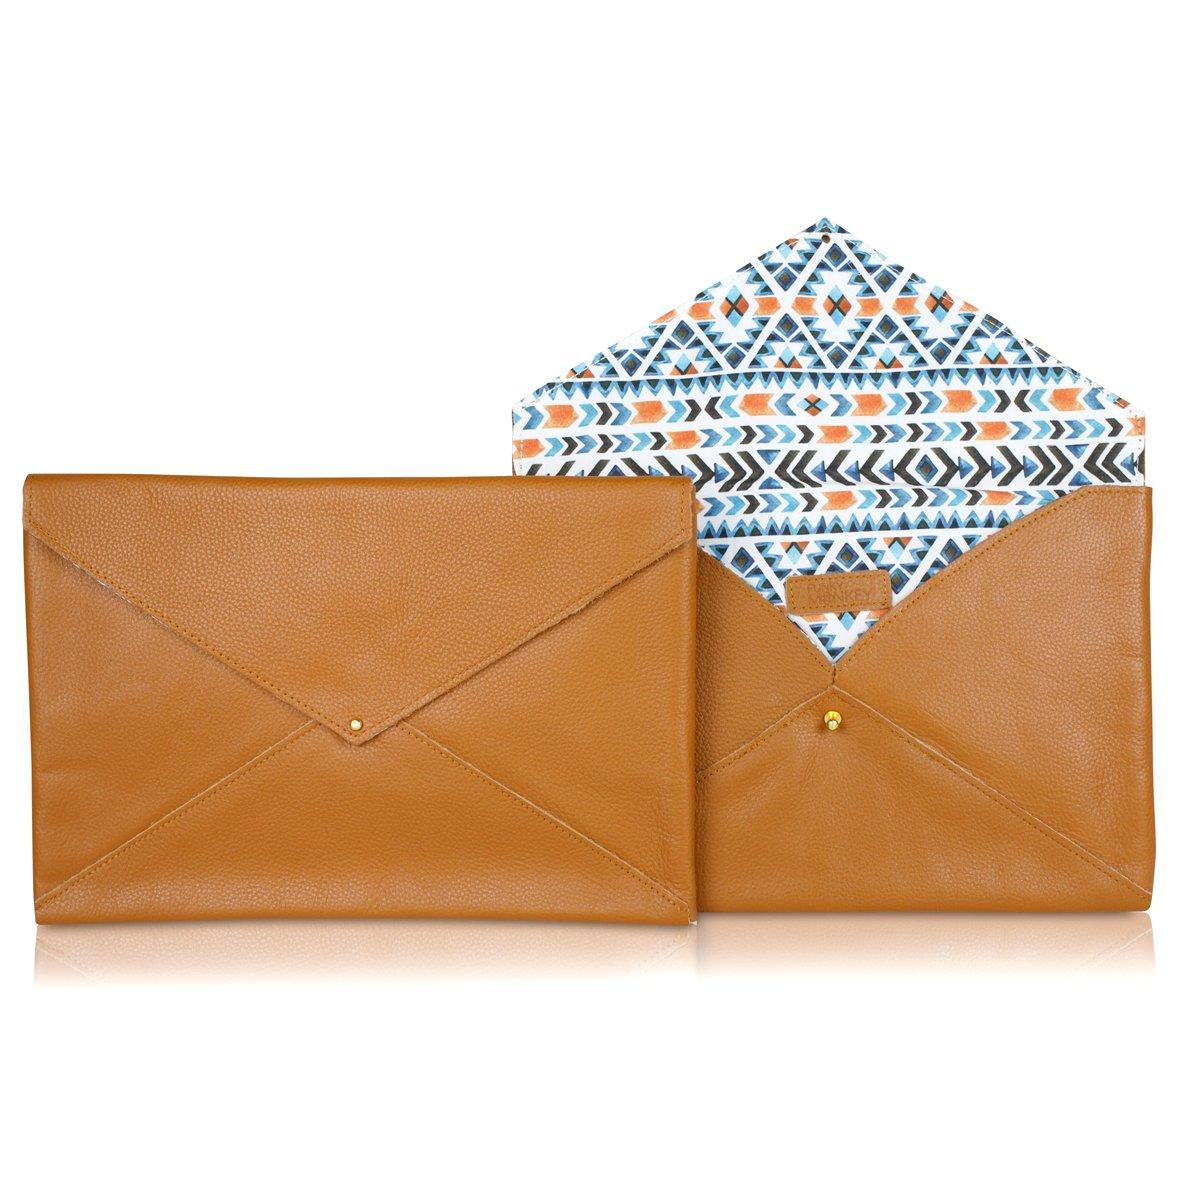 Funky Monkey Fashion Brand Envelope Clutch Bag For Women   Ladies Casual Evening Purse   Girls Night Club and Wedding Party Handbag - Aztec - Tan by Funky Monkey Fashion (Image #1)